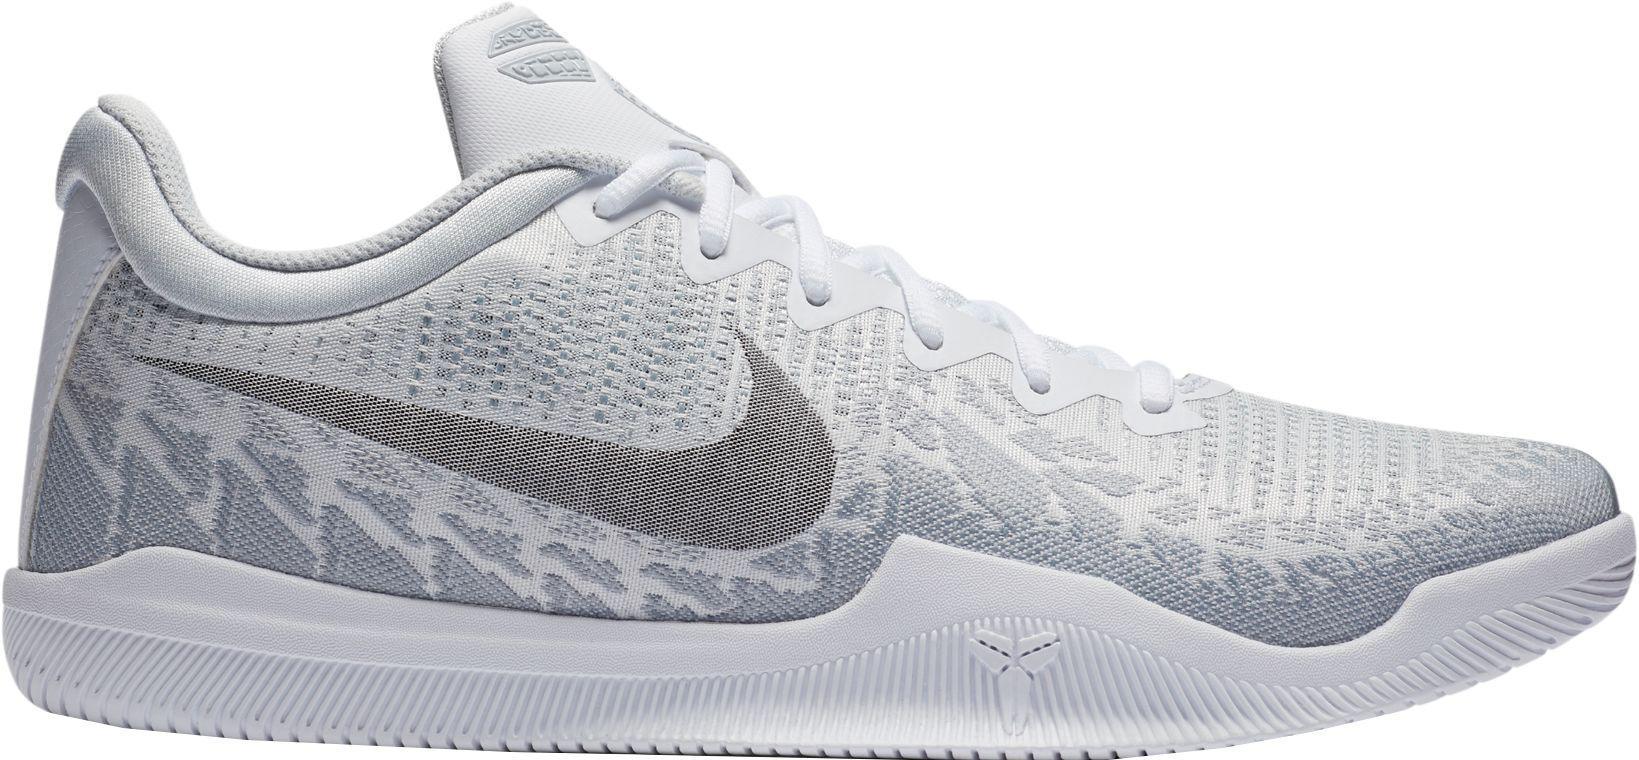 61fc037f036 Nike Kobe Mamba Rage Basketball Shoes in White for Men - Lyst